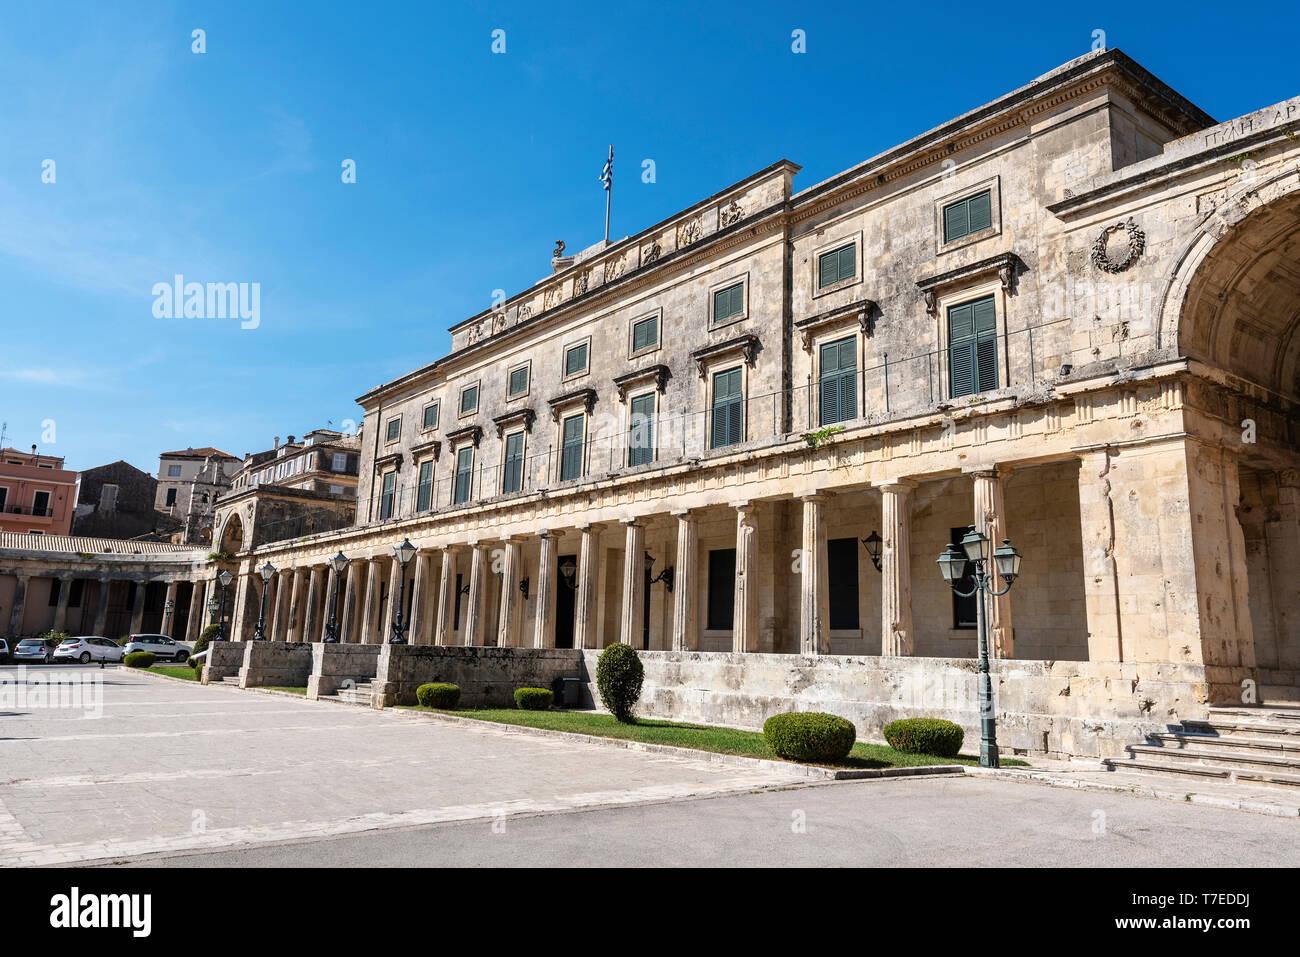 Asian Art Museum, old town, Kerkyra, Corfu Island, Ionian Islands, Greece - Stock Image